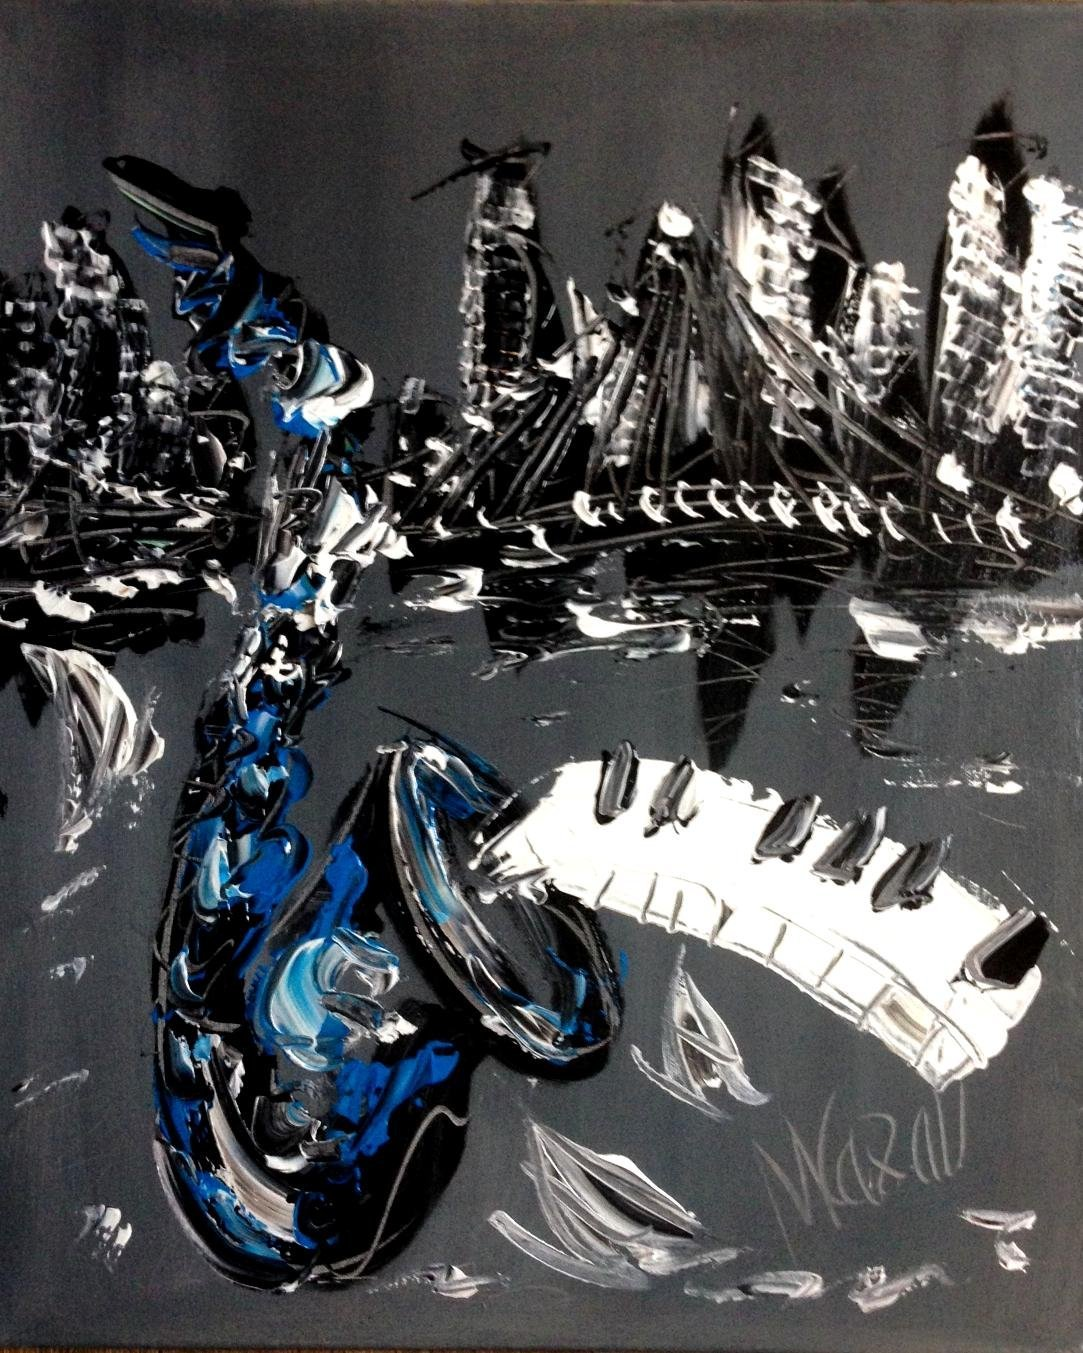 COLLAGE OBEY THE FUN Rency Signed by Artist #//70 Banksy Pop Art $2 Bill U.S